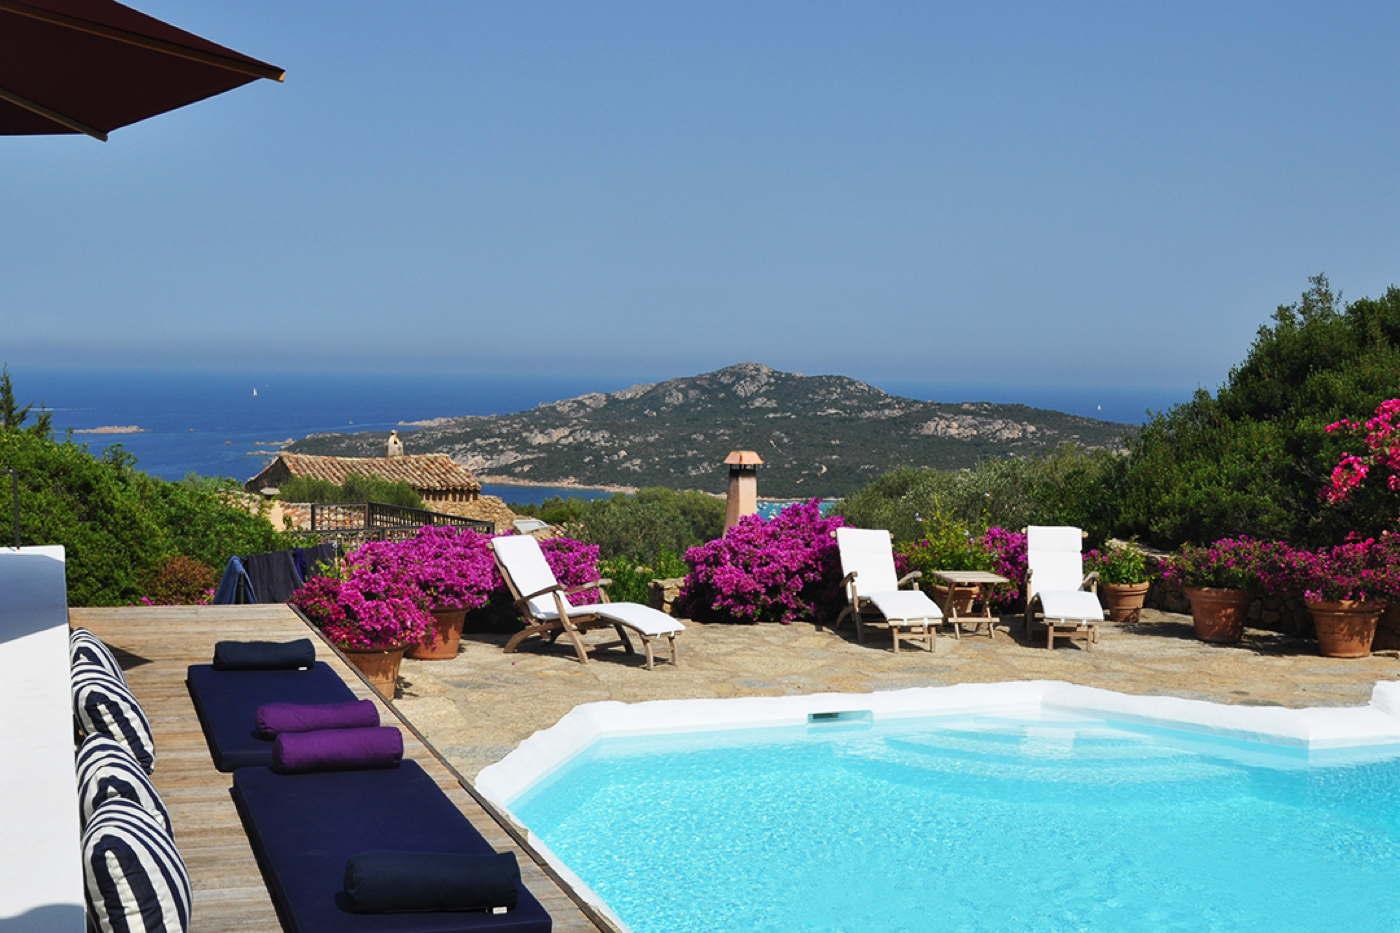 ferienhaus mieten italien ferienvilla mit pool porto cervo. Black Bedroom Furniture Sets. Home Design Ideas